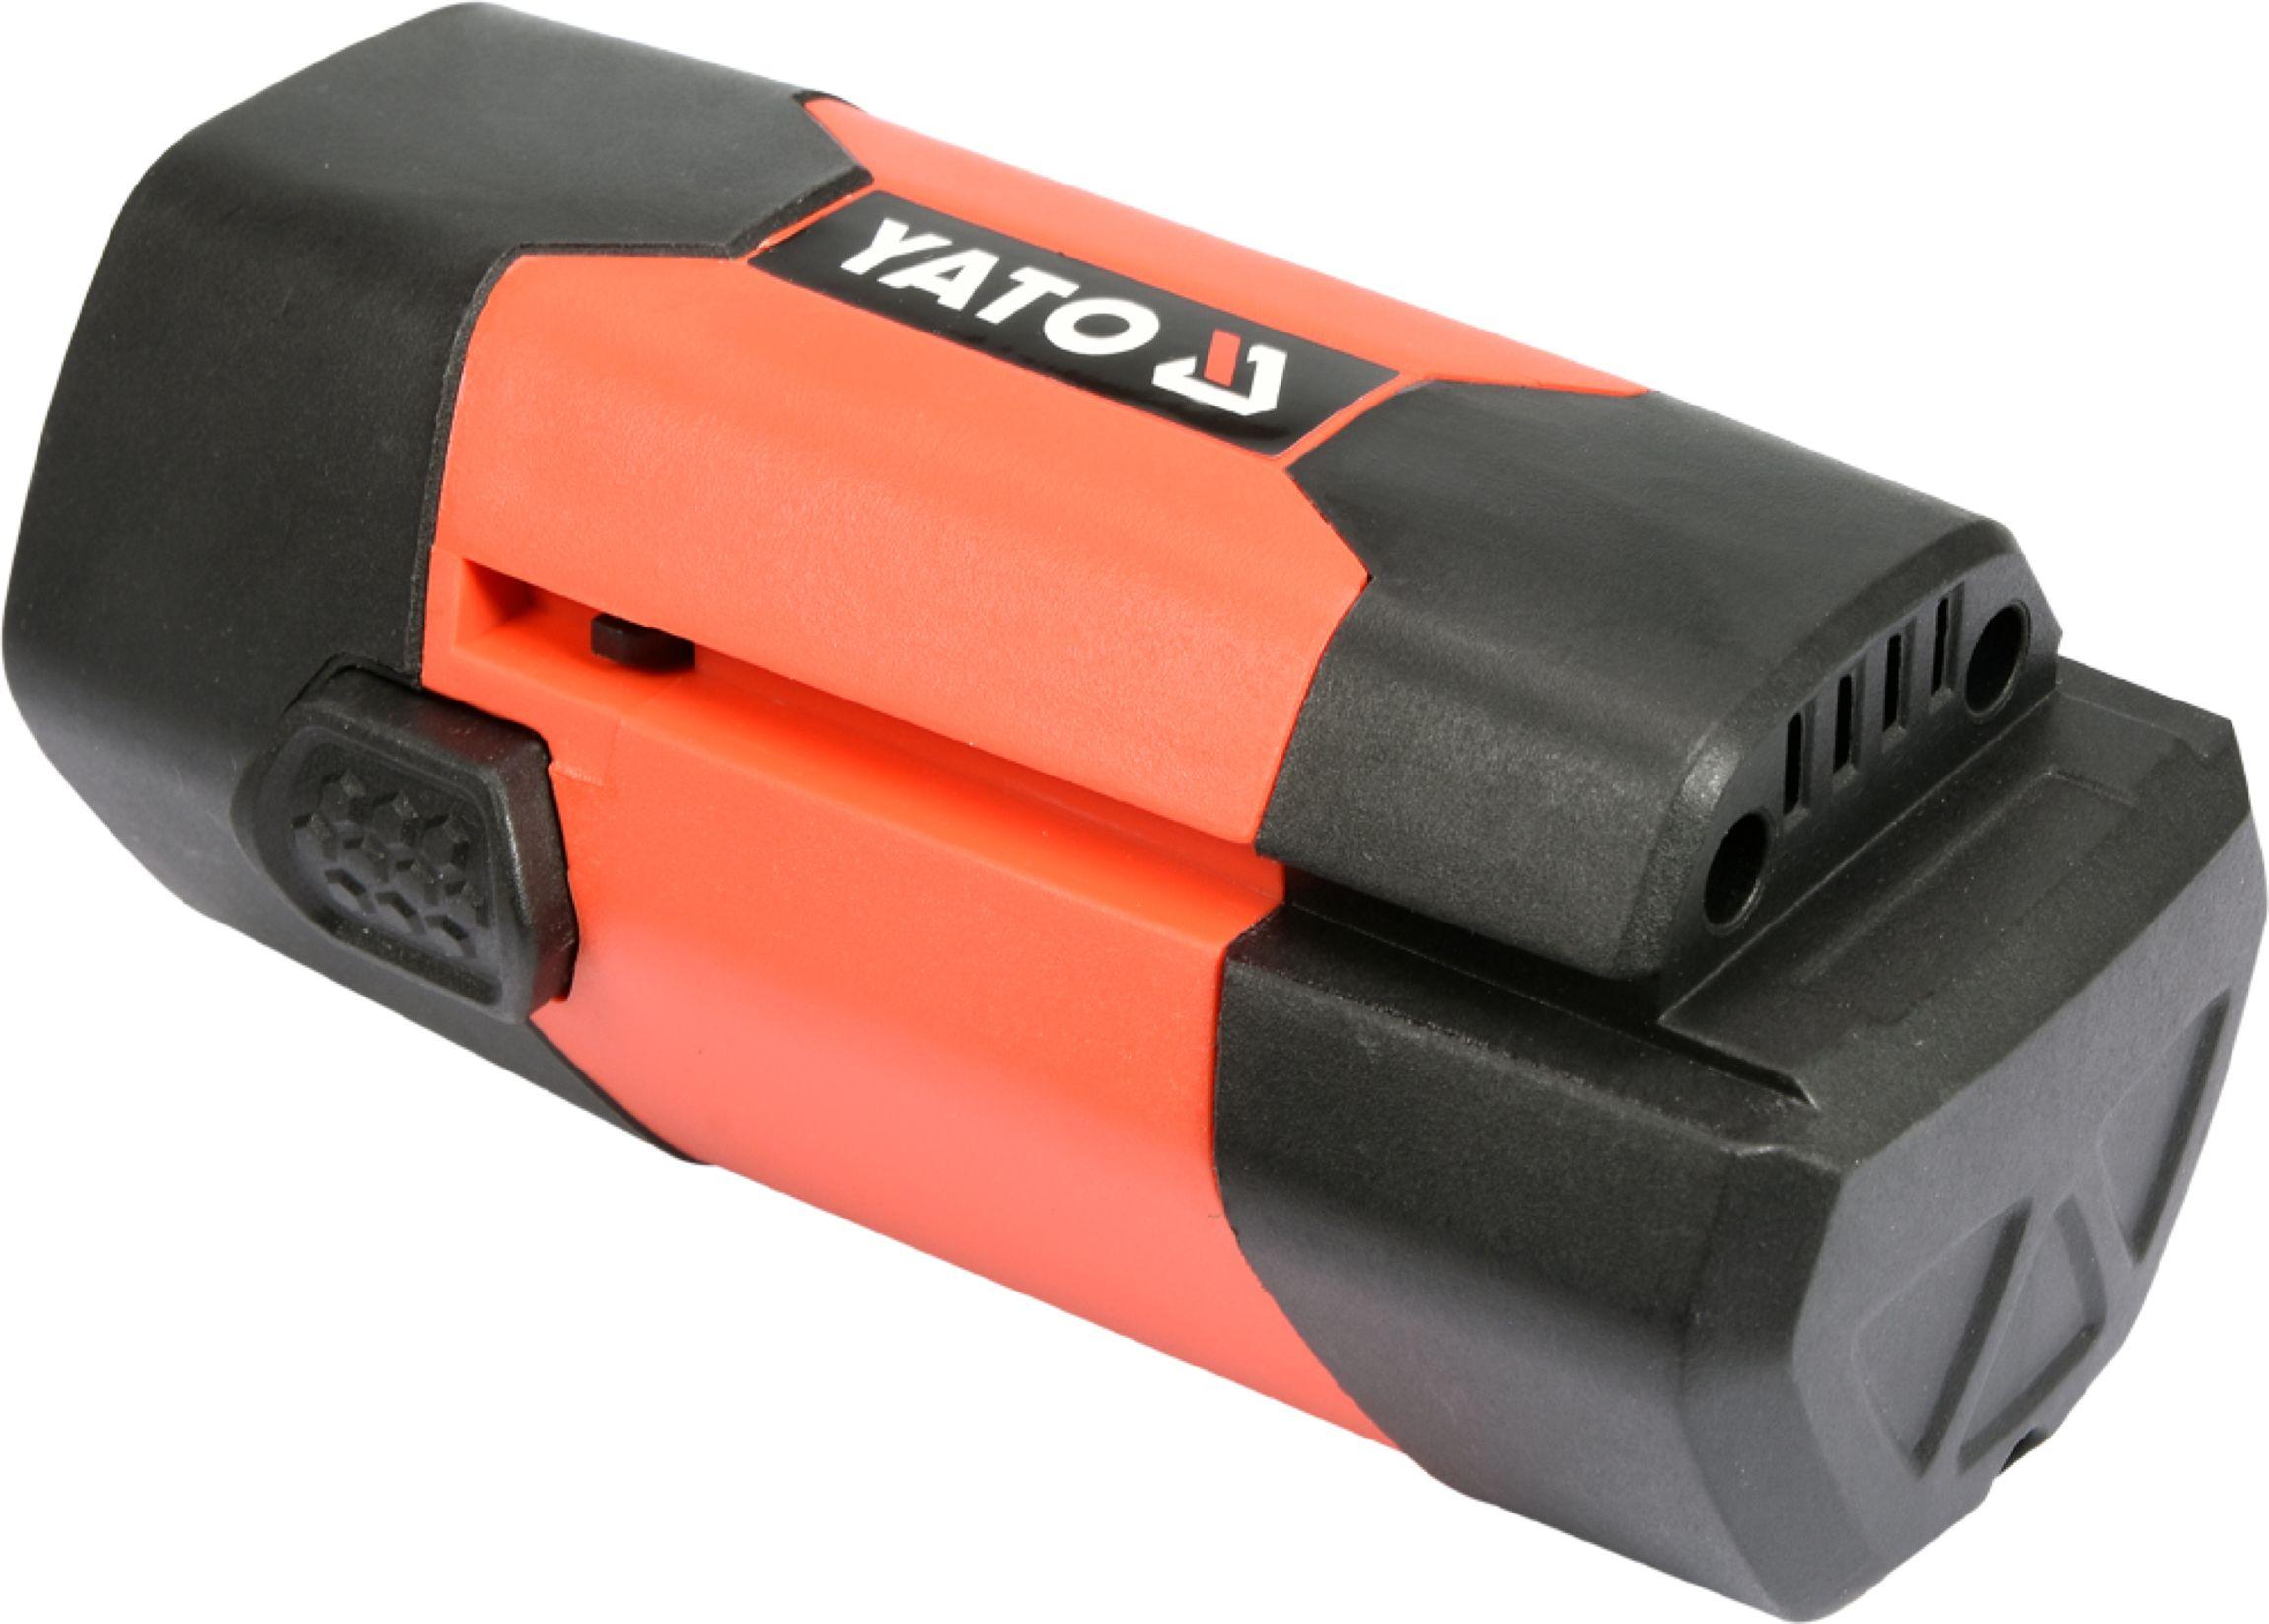 Baterie náhradní 18V Li-ion 3.0 AH (YT-85110. YT-85120)